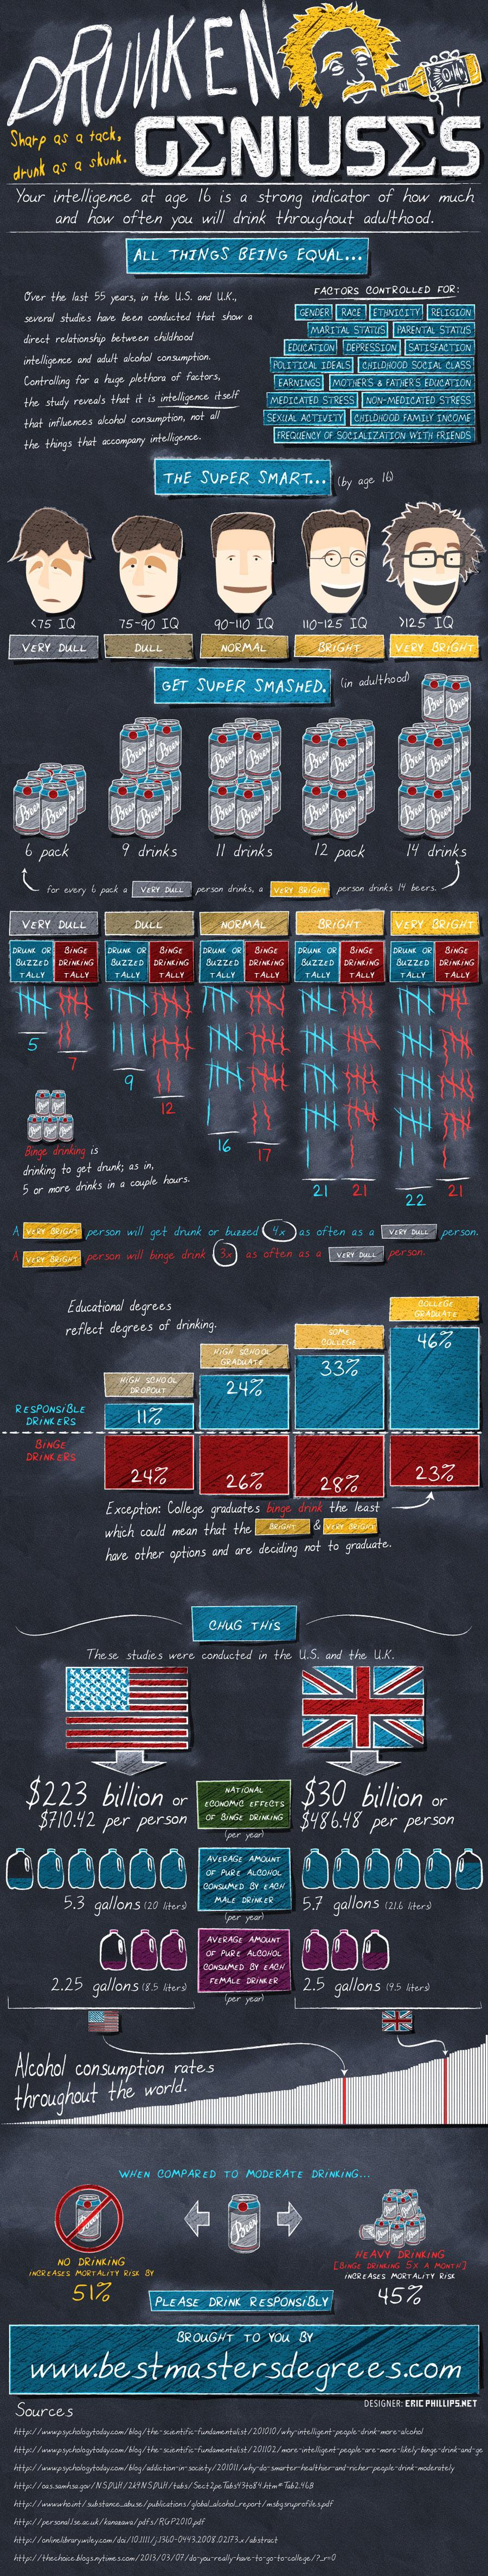 Correlation Between Intelligence & Drinking Alcohol [Infographic]